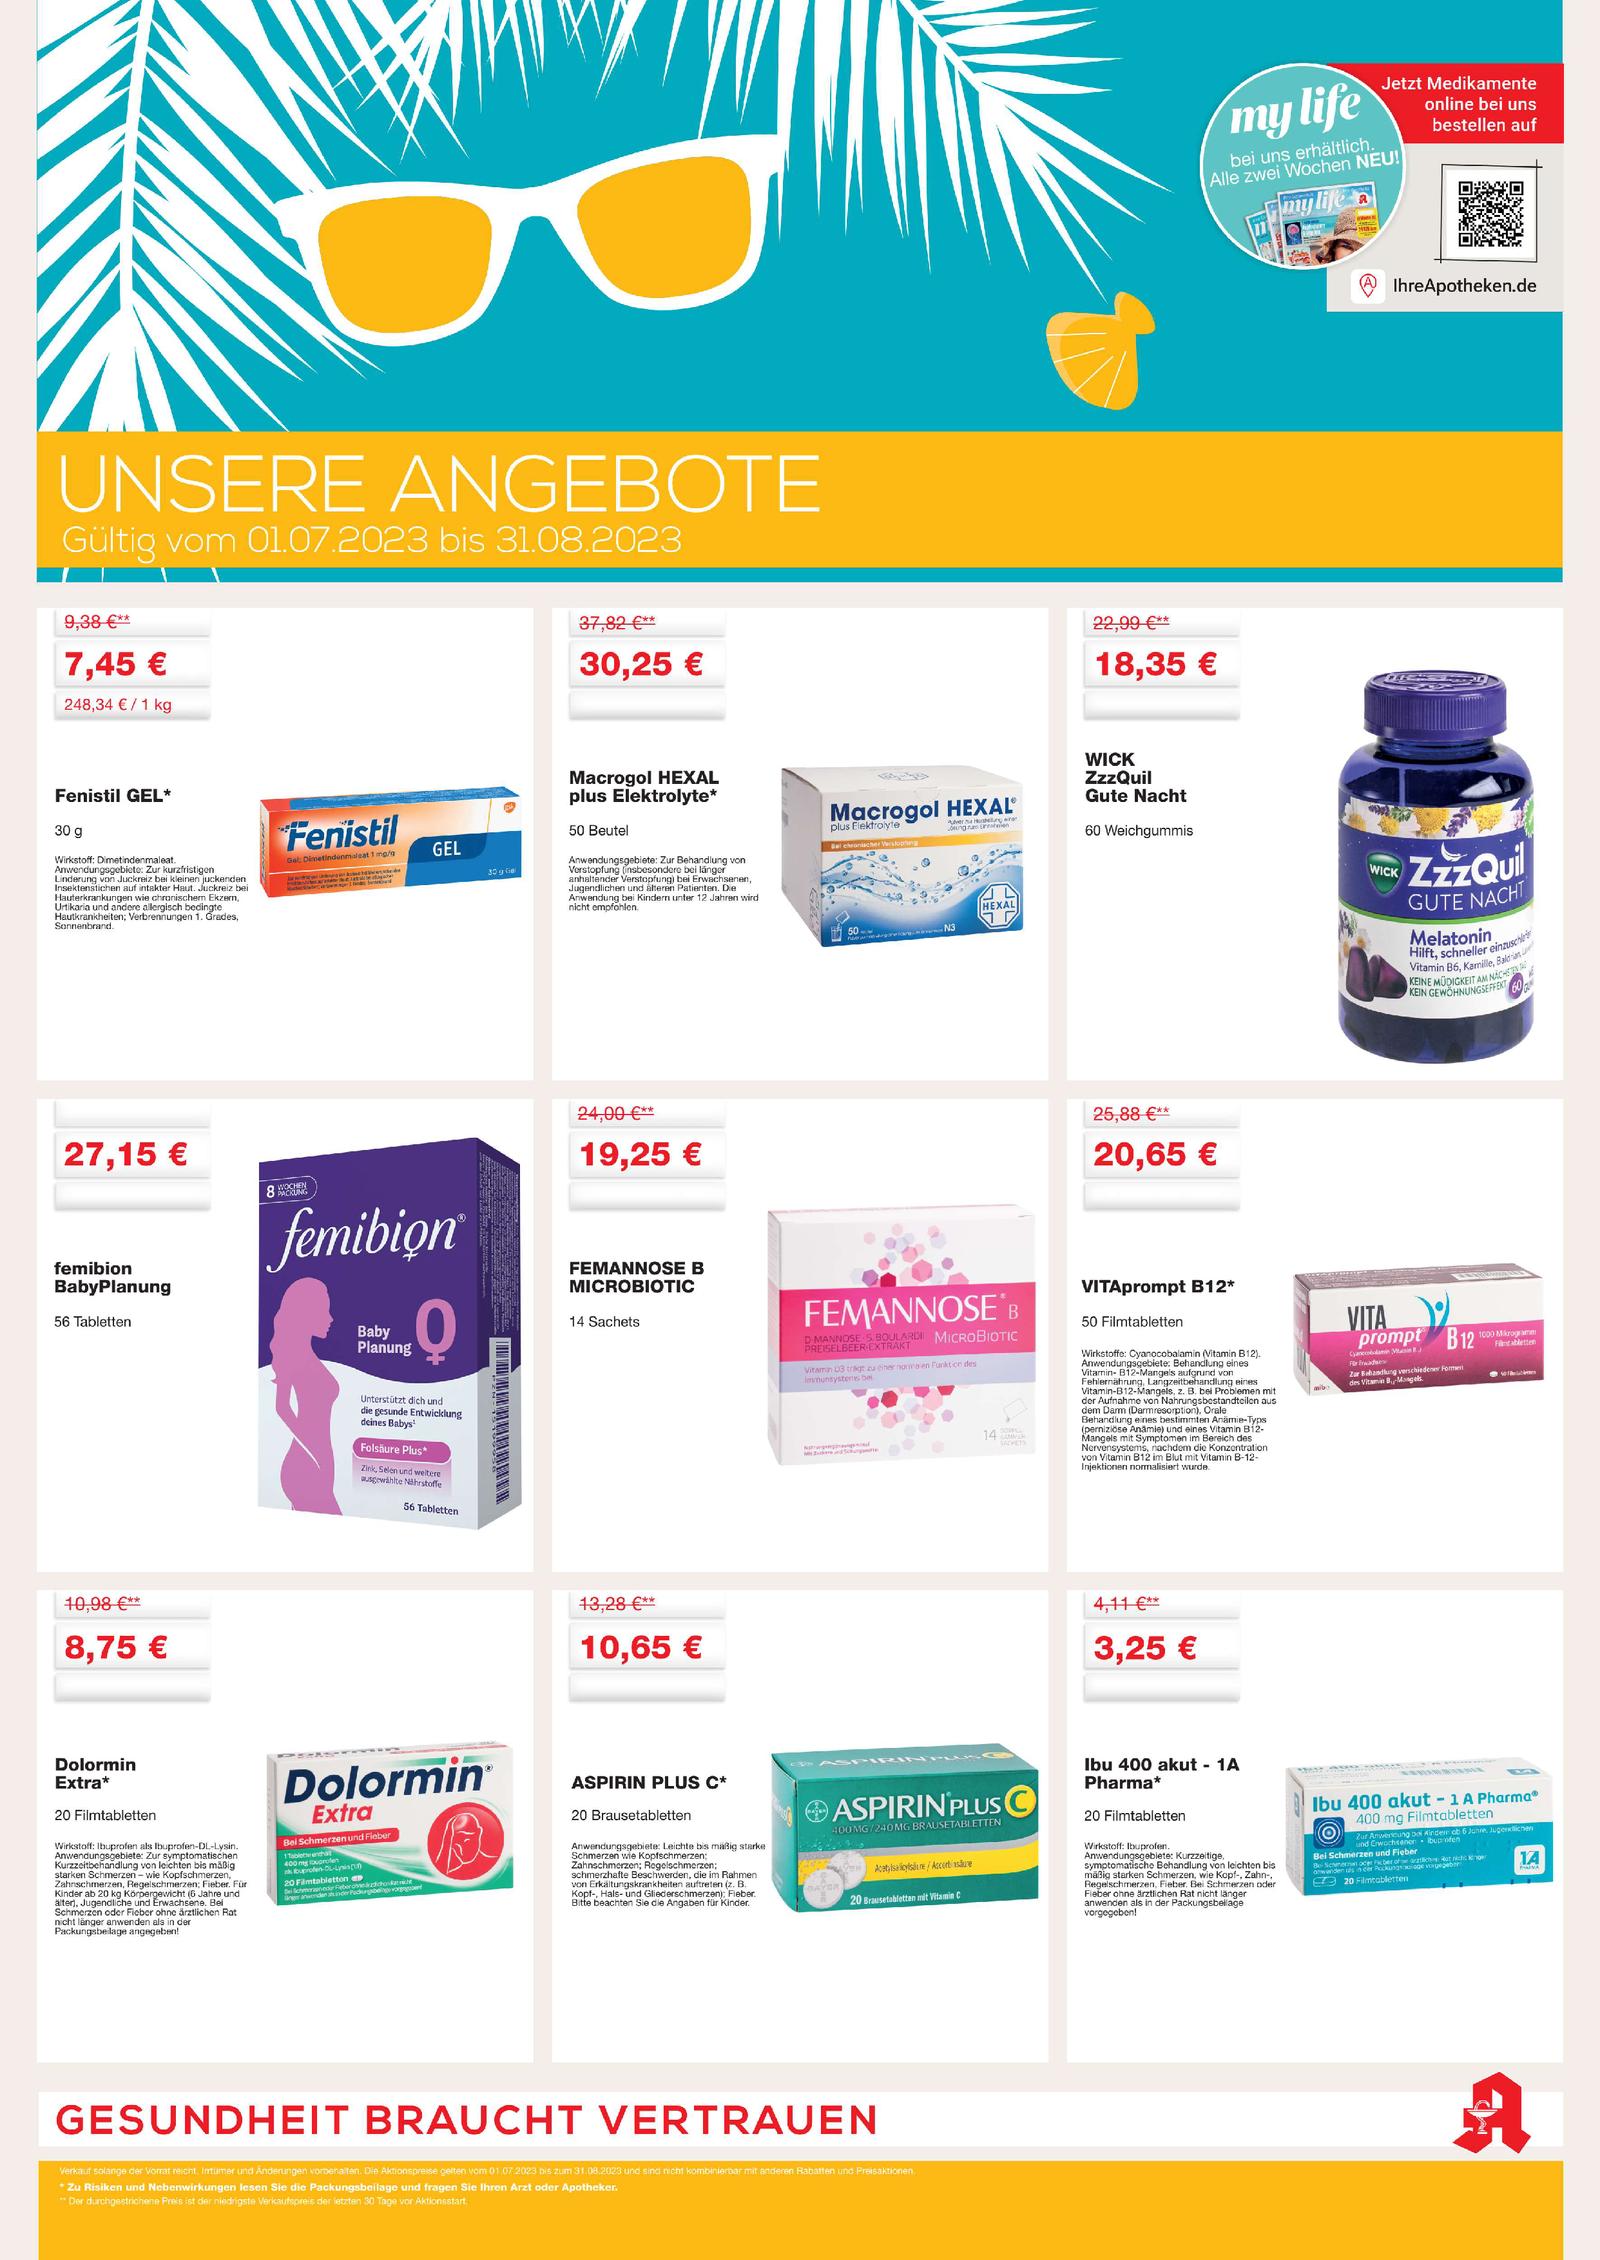 https://mein-uploads.apocdn.net/7929/leaflets/7929_flyer-Seite1.png